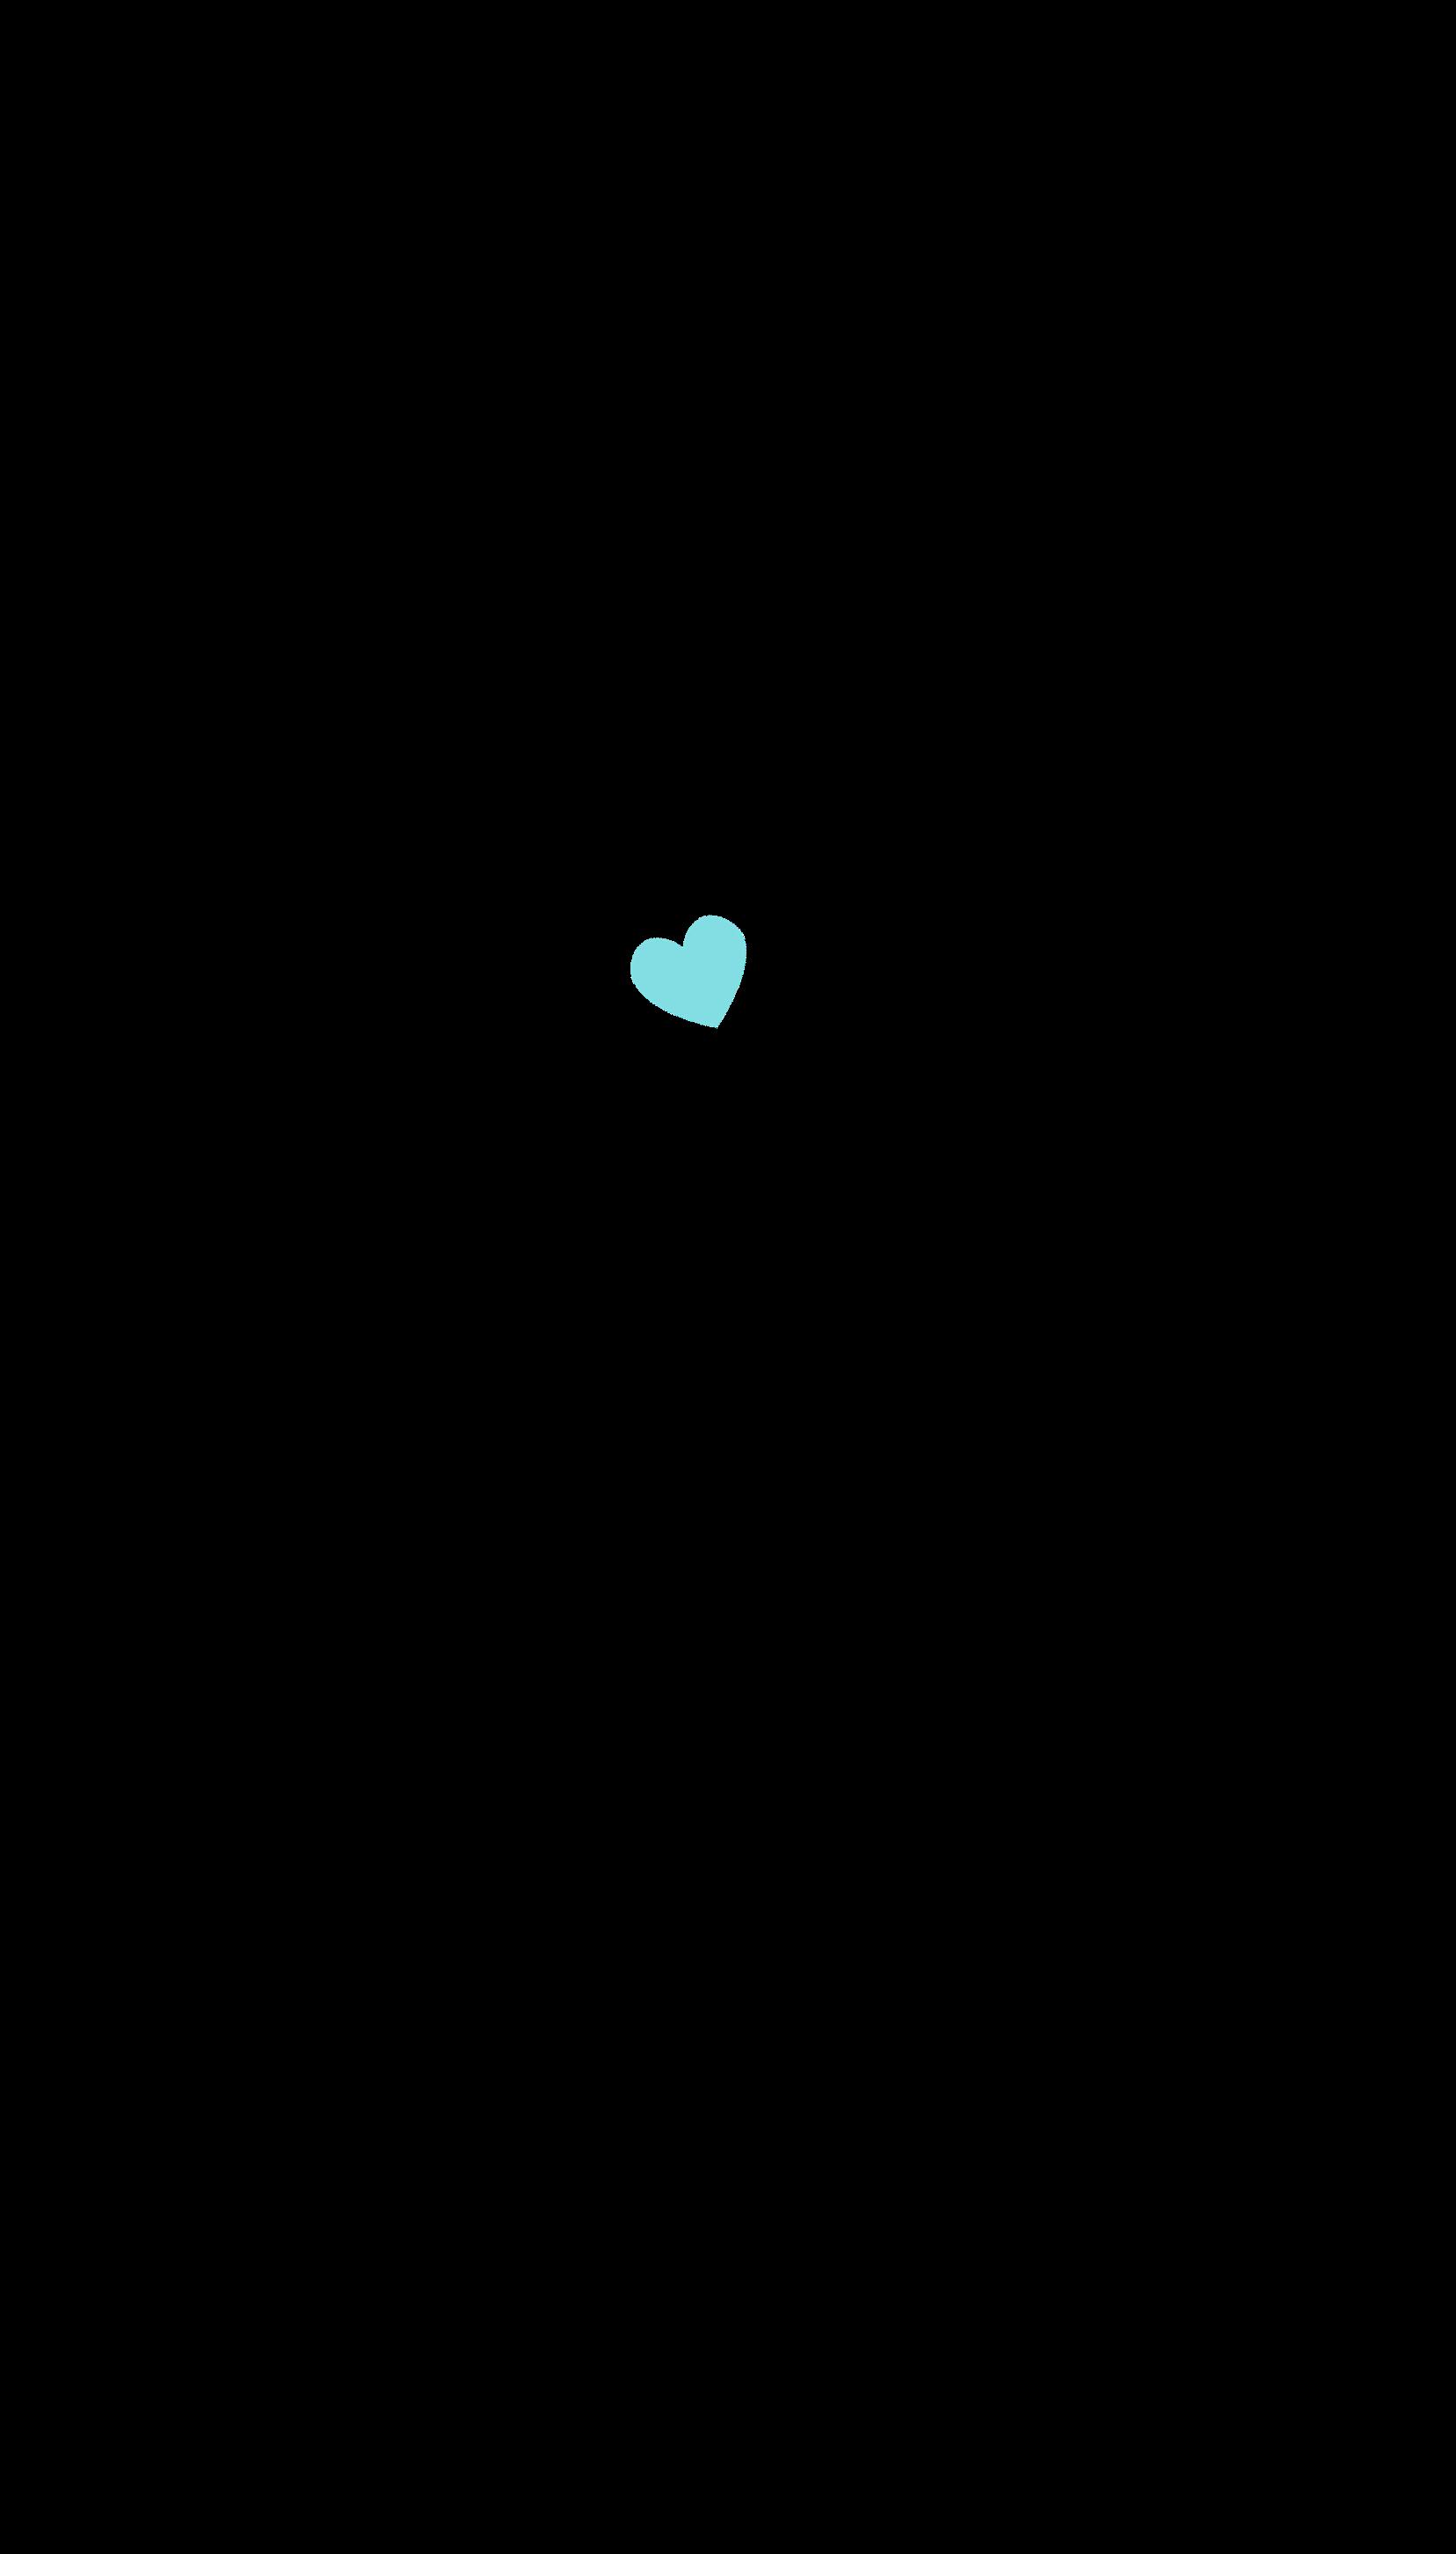 Teal AGL logo